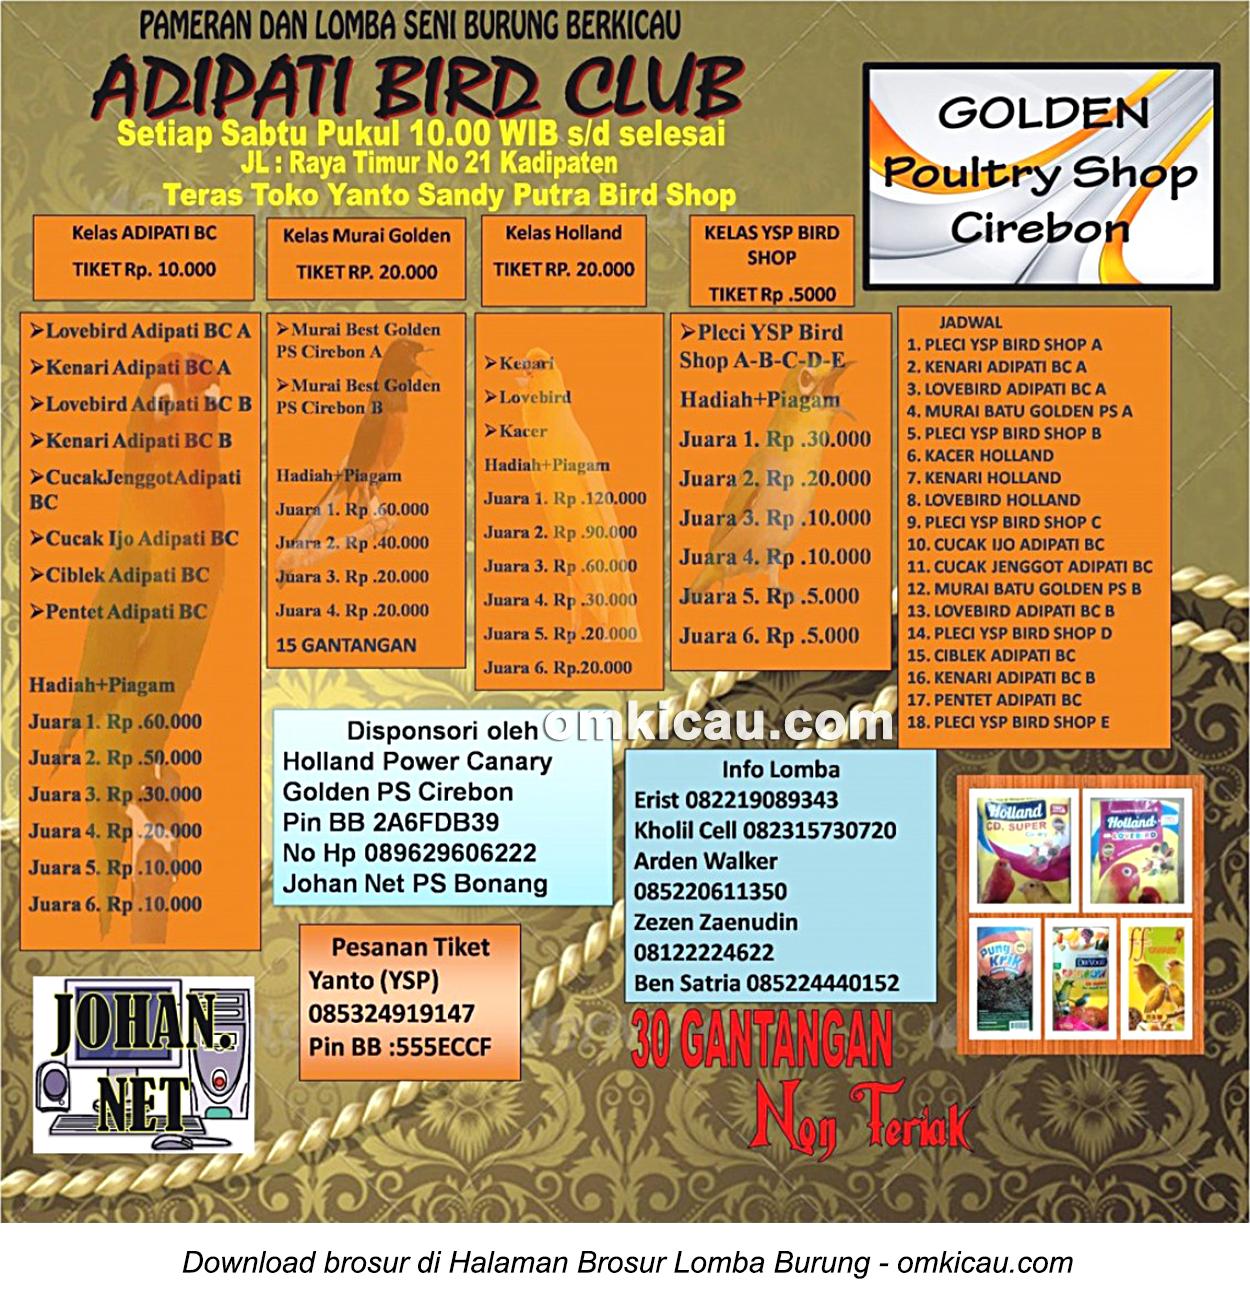 Brosur lomba Adipati BC Kadipaten, Cirebon, setiap Sabtu jam 10